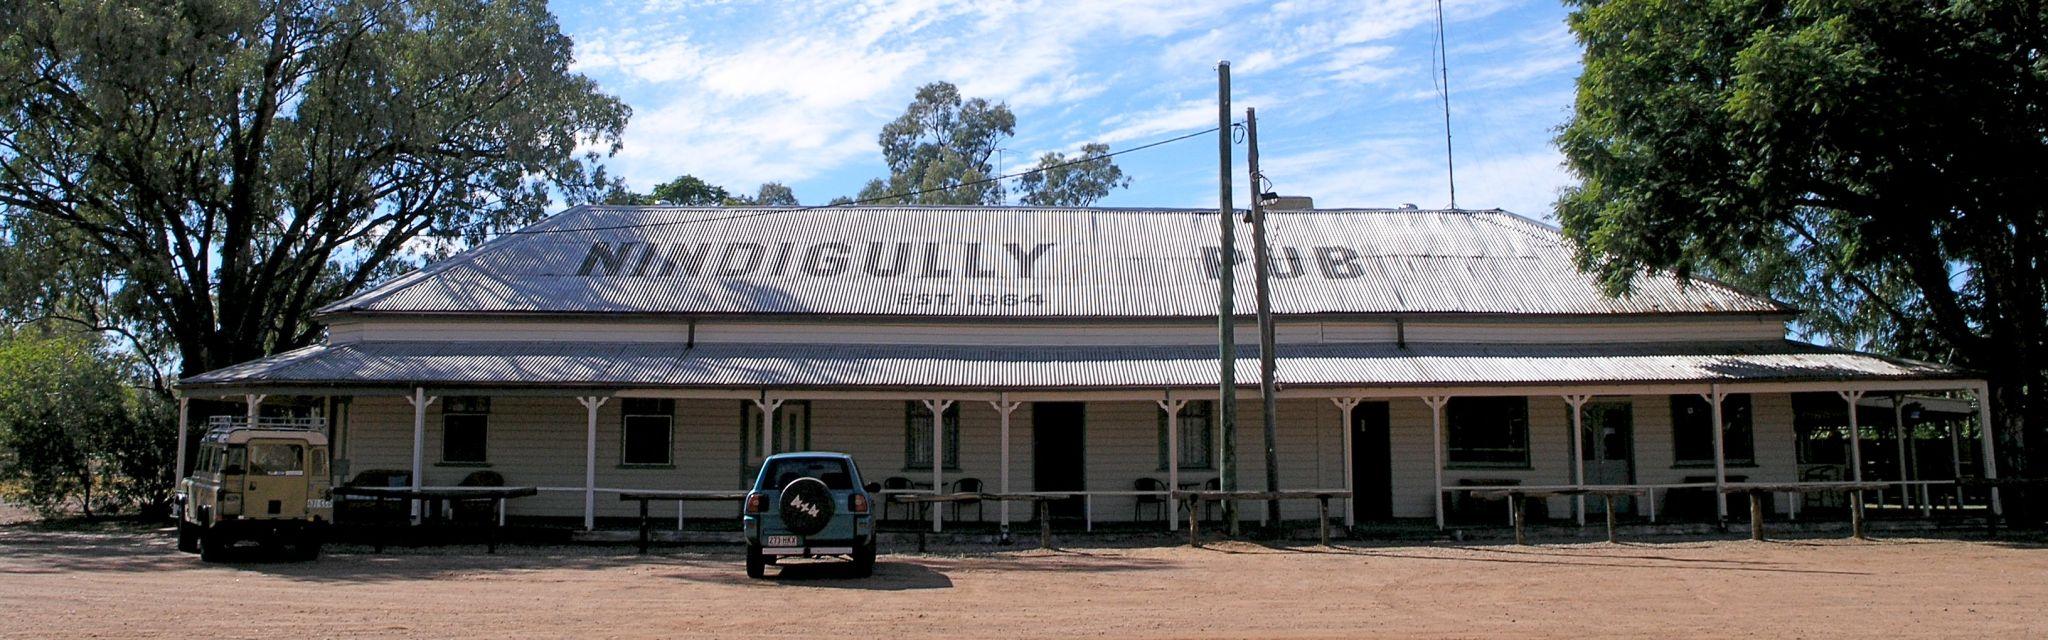 Historic Nindigully Pub, image from a Nature Bound Australia Uniquely Australia tour